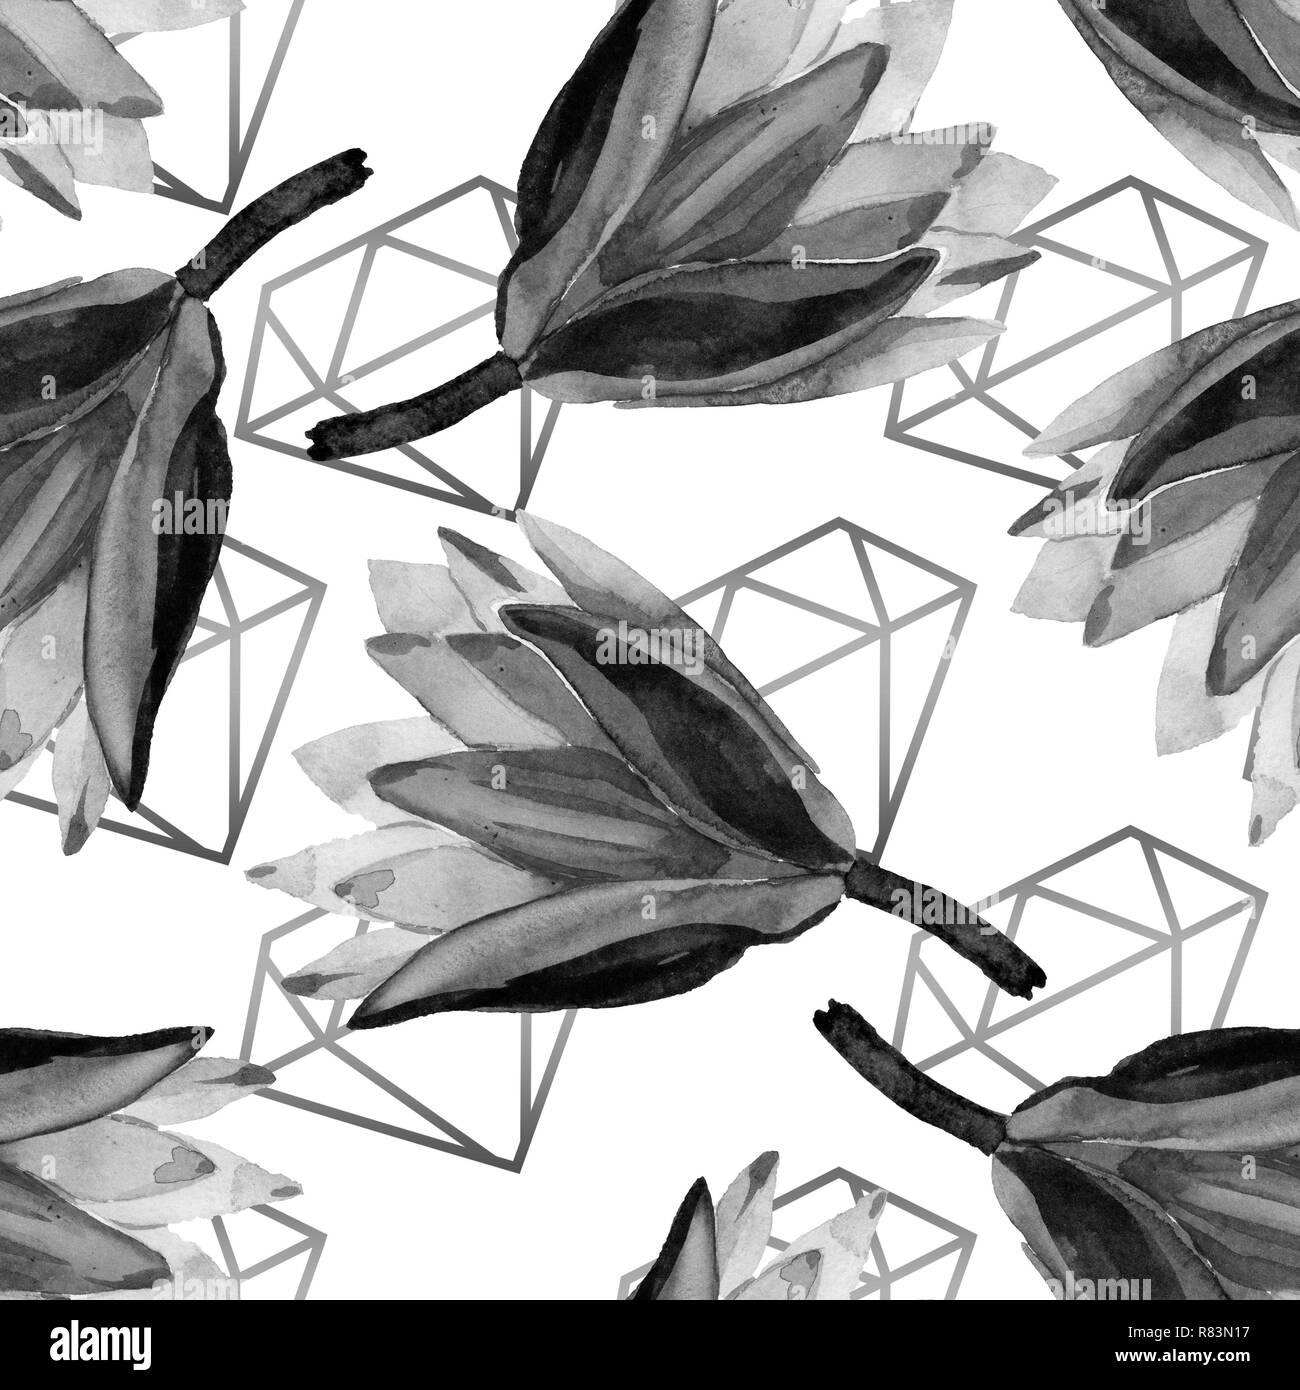 Black Lotus Floral Botanical Flower Watercolor Background Illustration Set Seamless Background Pattern Fabric Wallpaper Print Texture Stock Photo Alamy